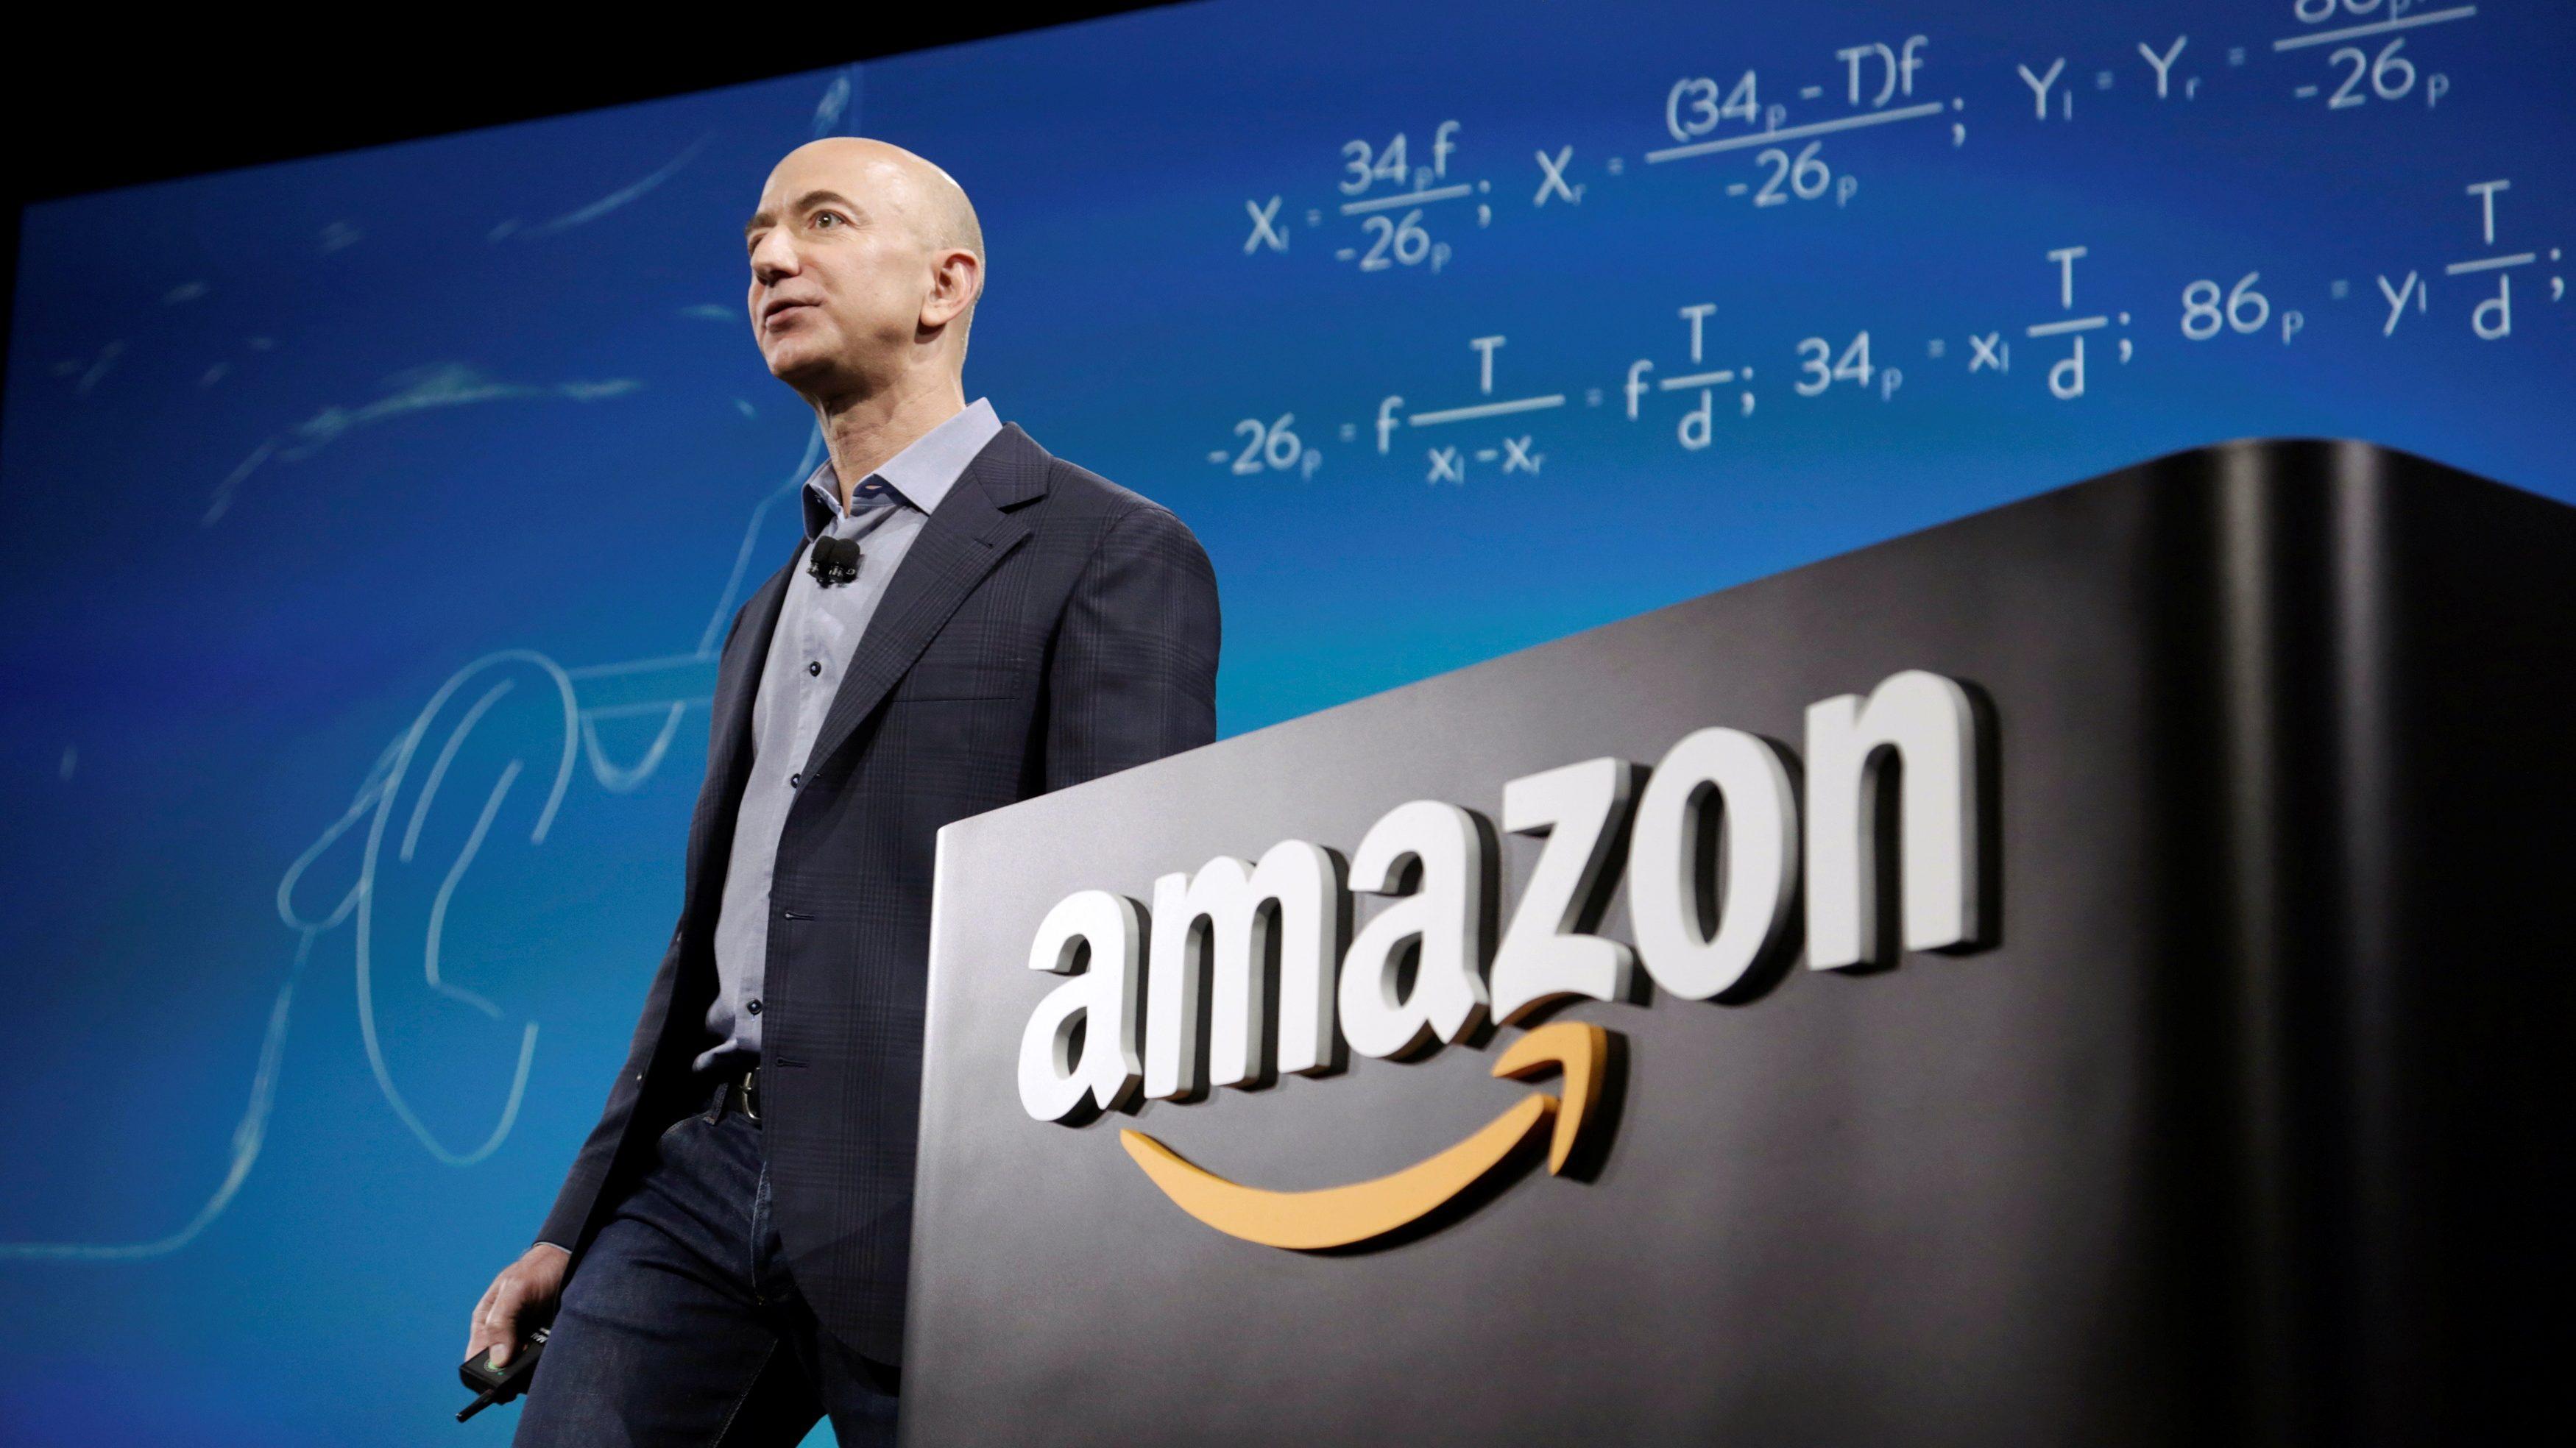 Amazon CEO Jeff Bezos at a company event